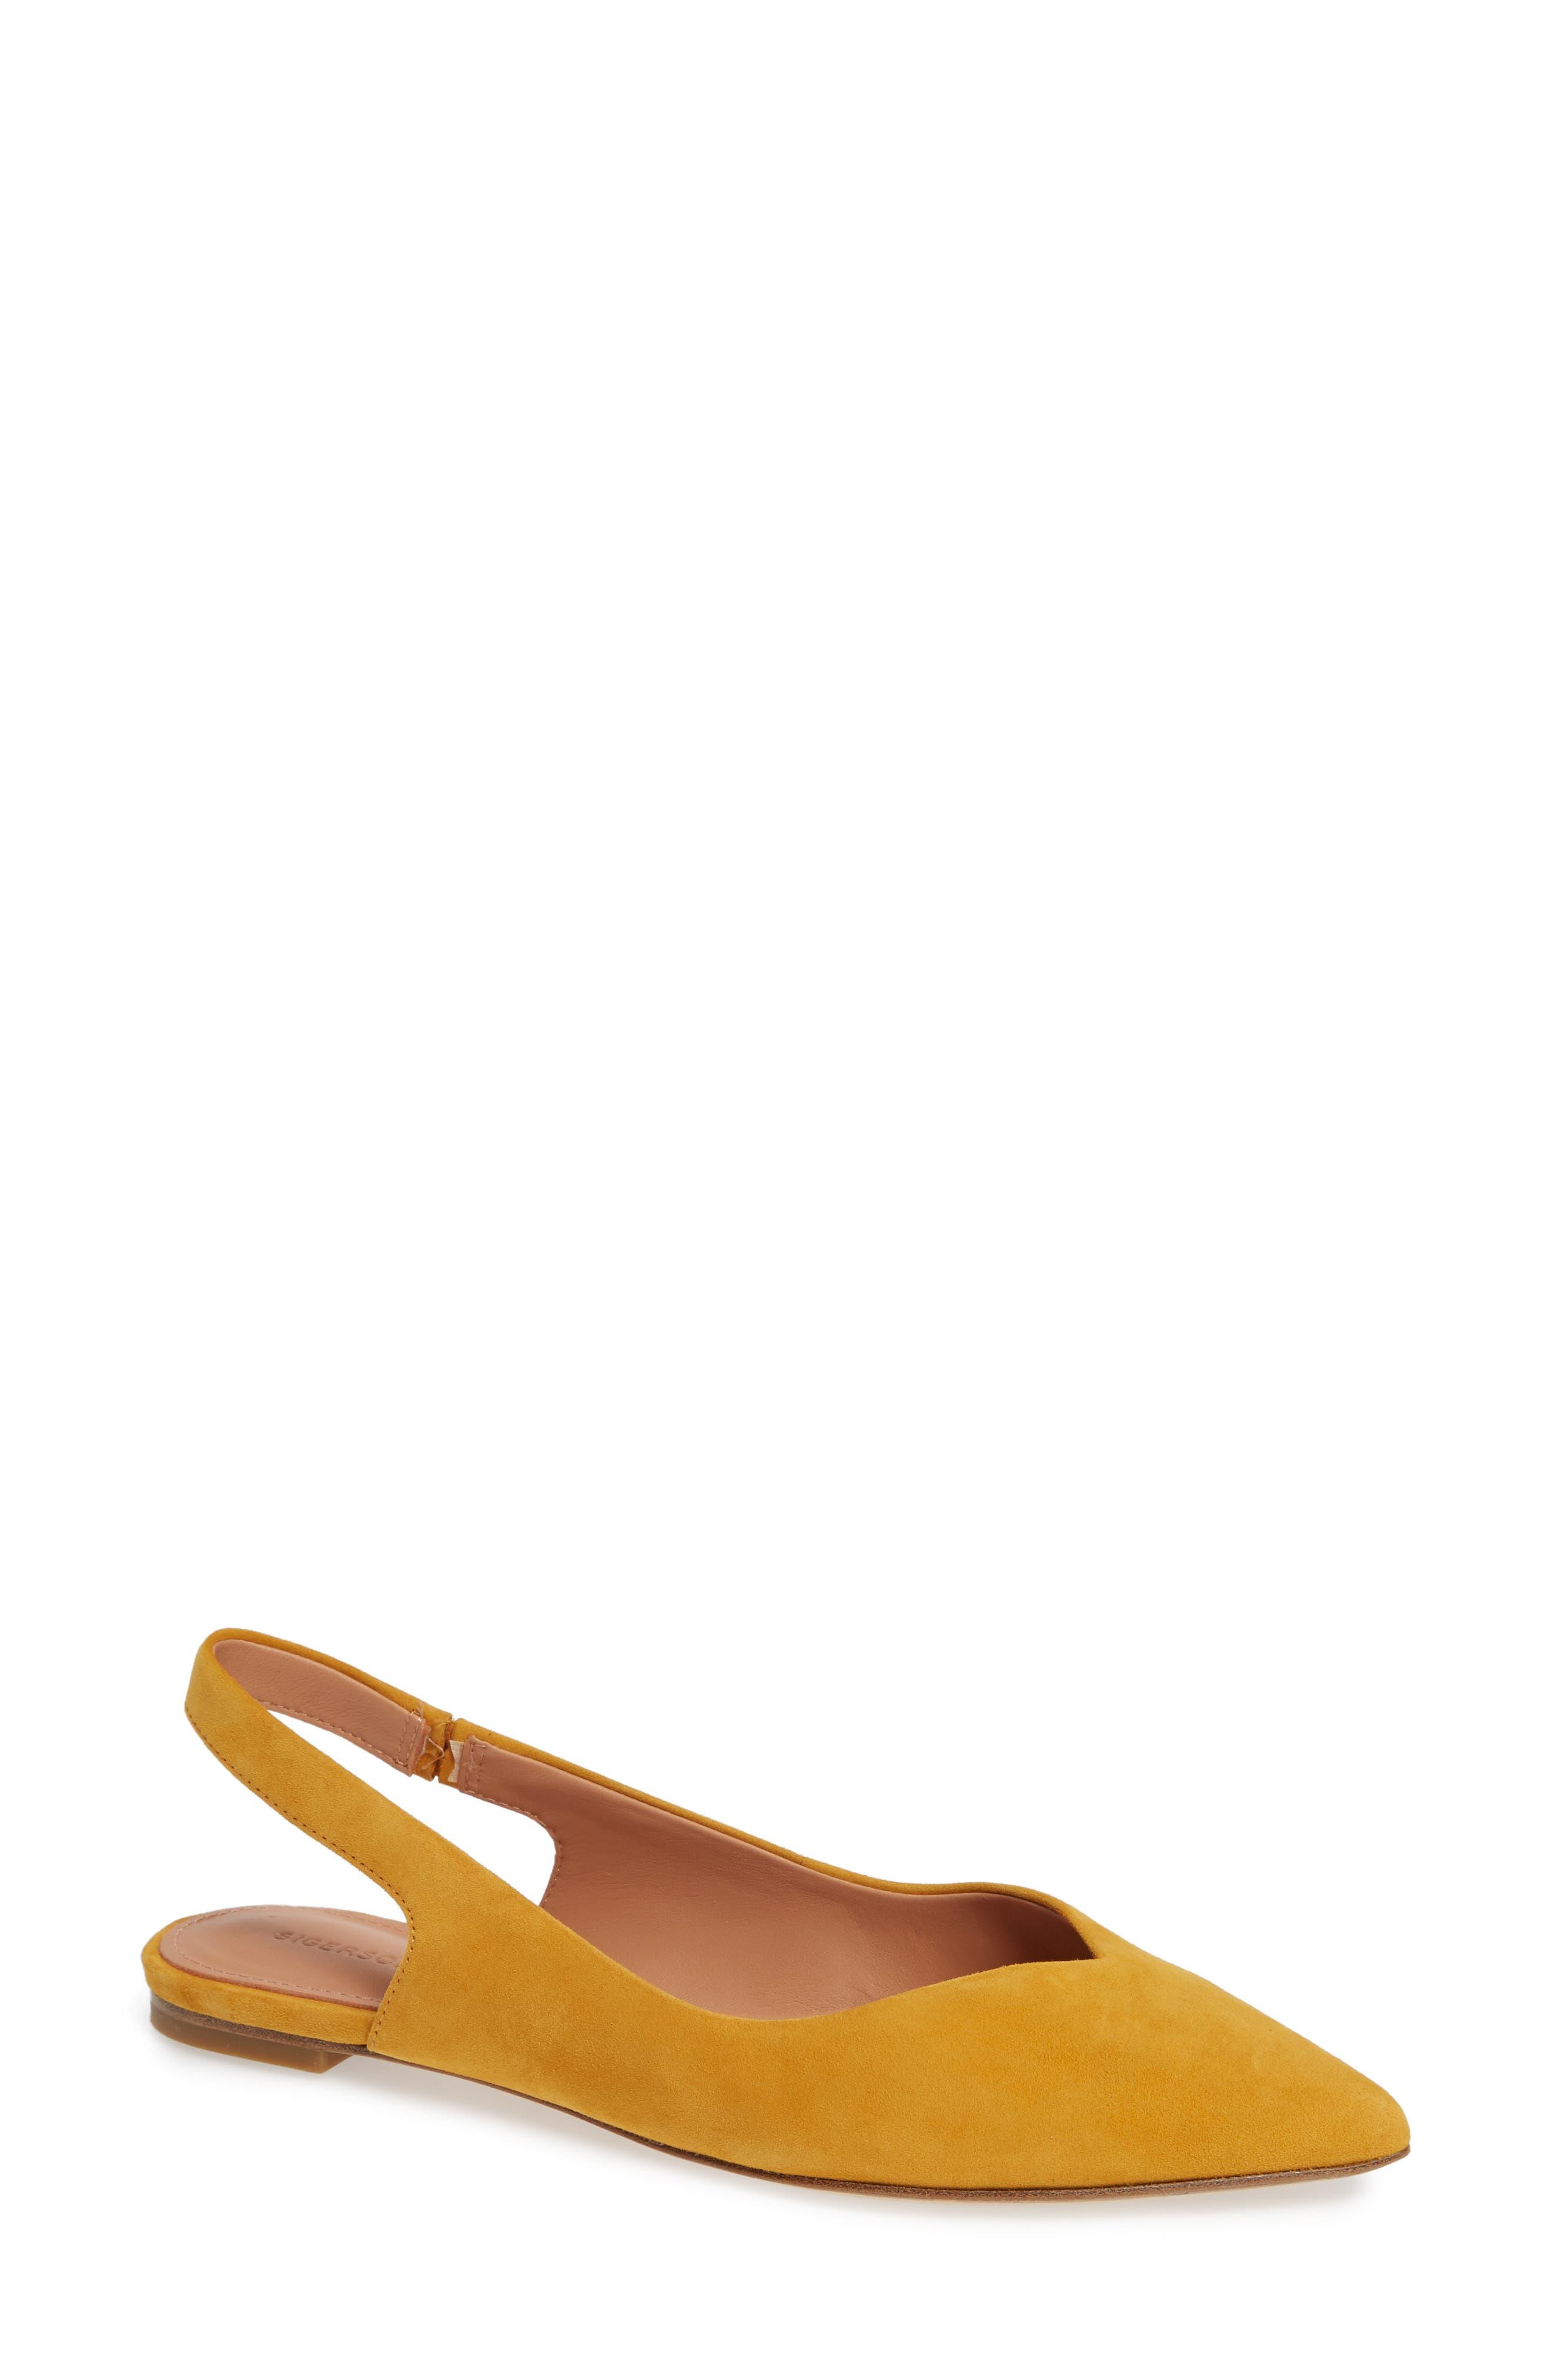 Women'S Sunshine Slingback Pointed-Toe Flats in Sunflower